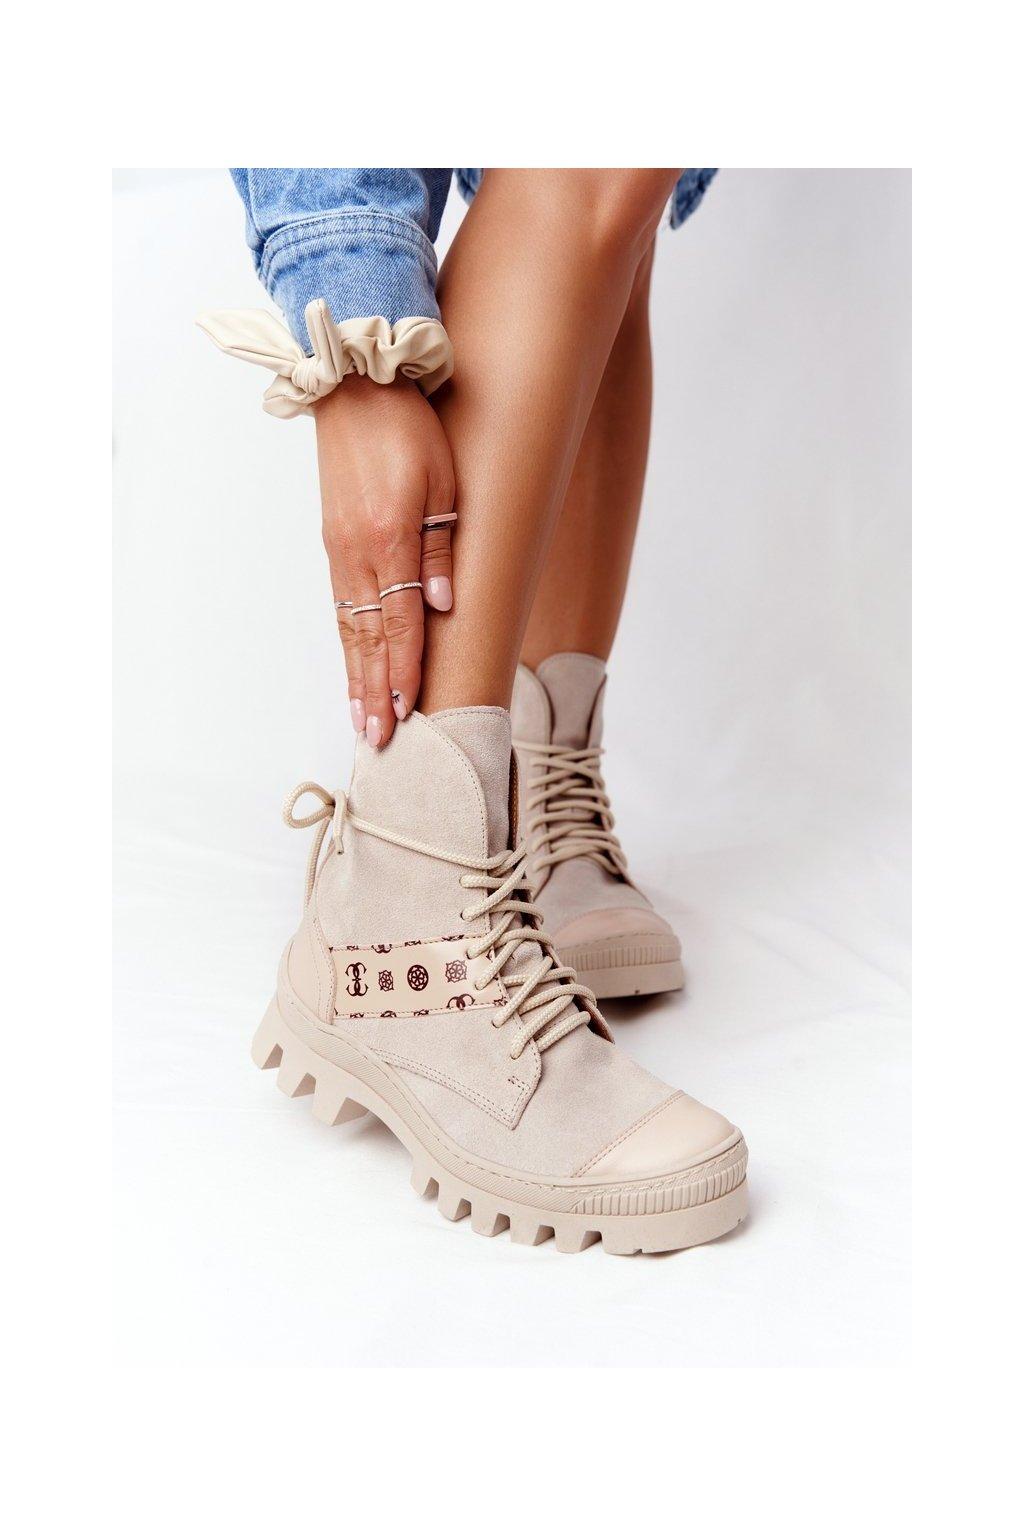 Členkové topánky na podpätku farba hnedá kód obuvi 2942-0 BEŻ JASNY WELUR